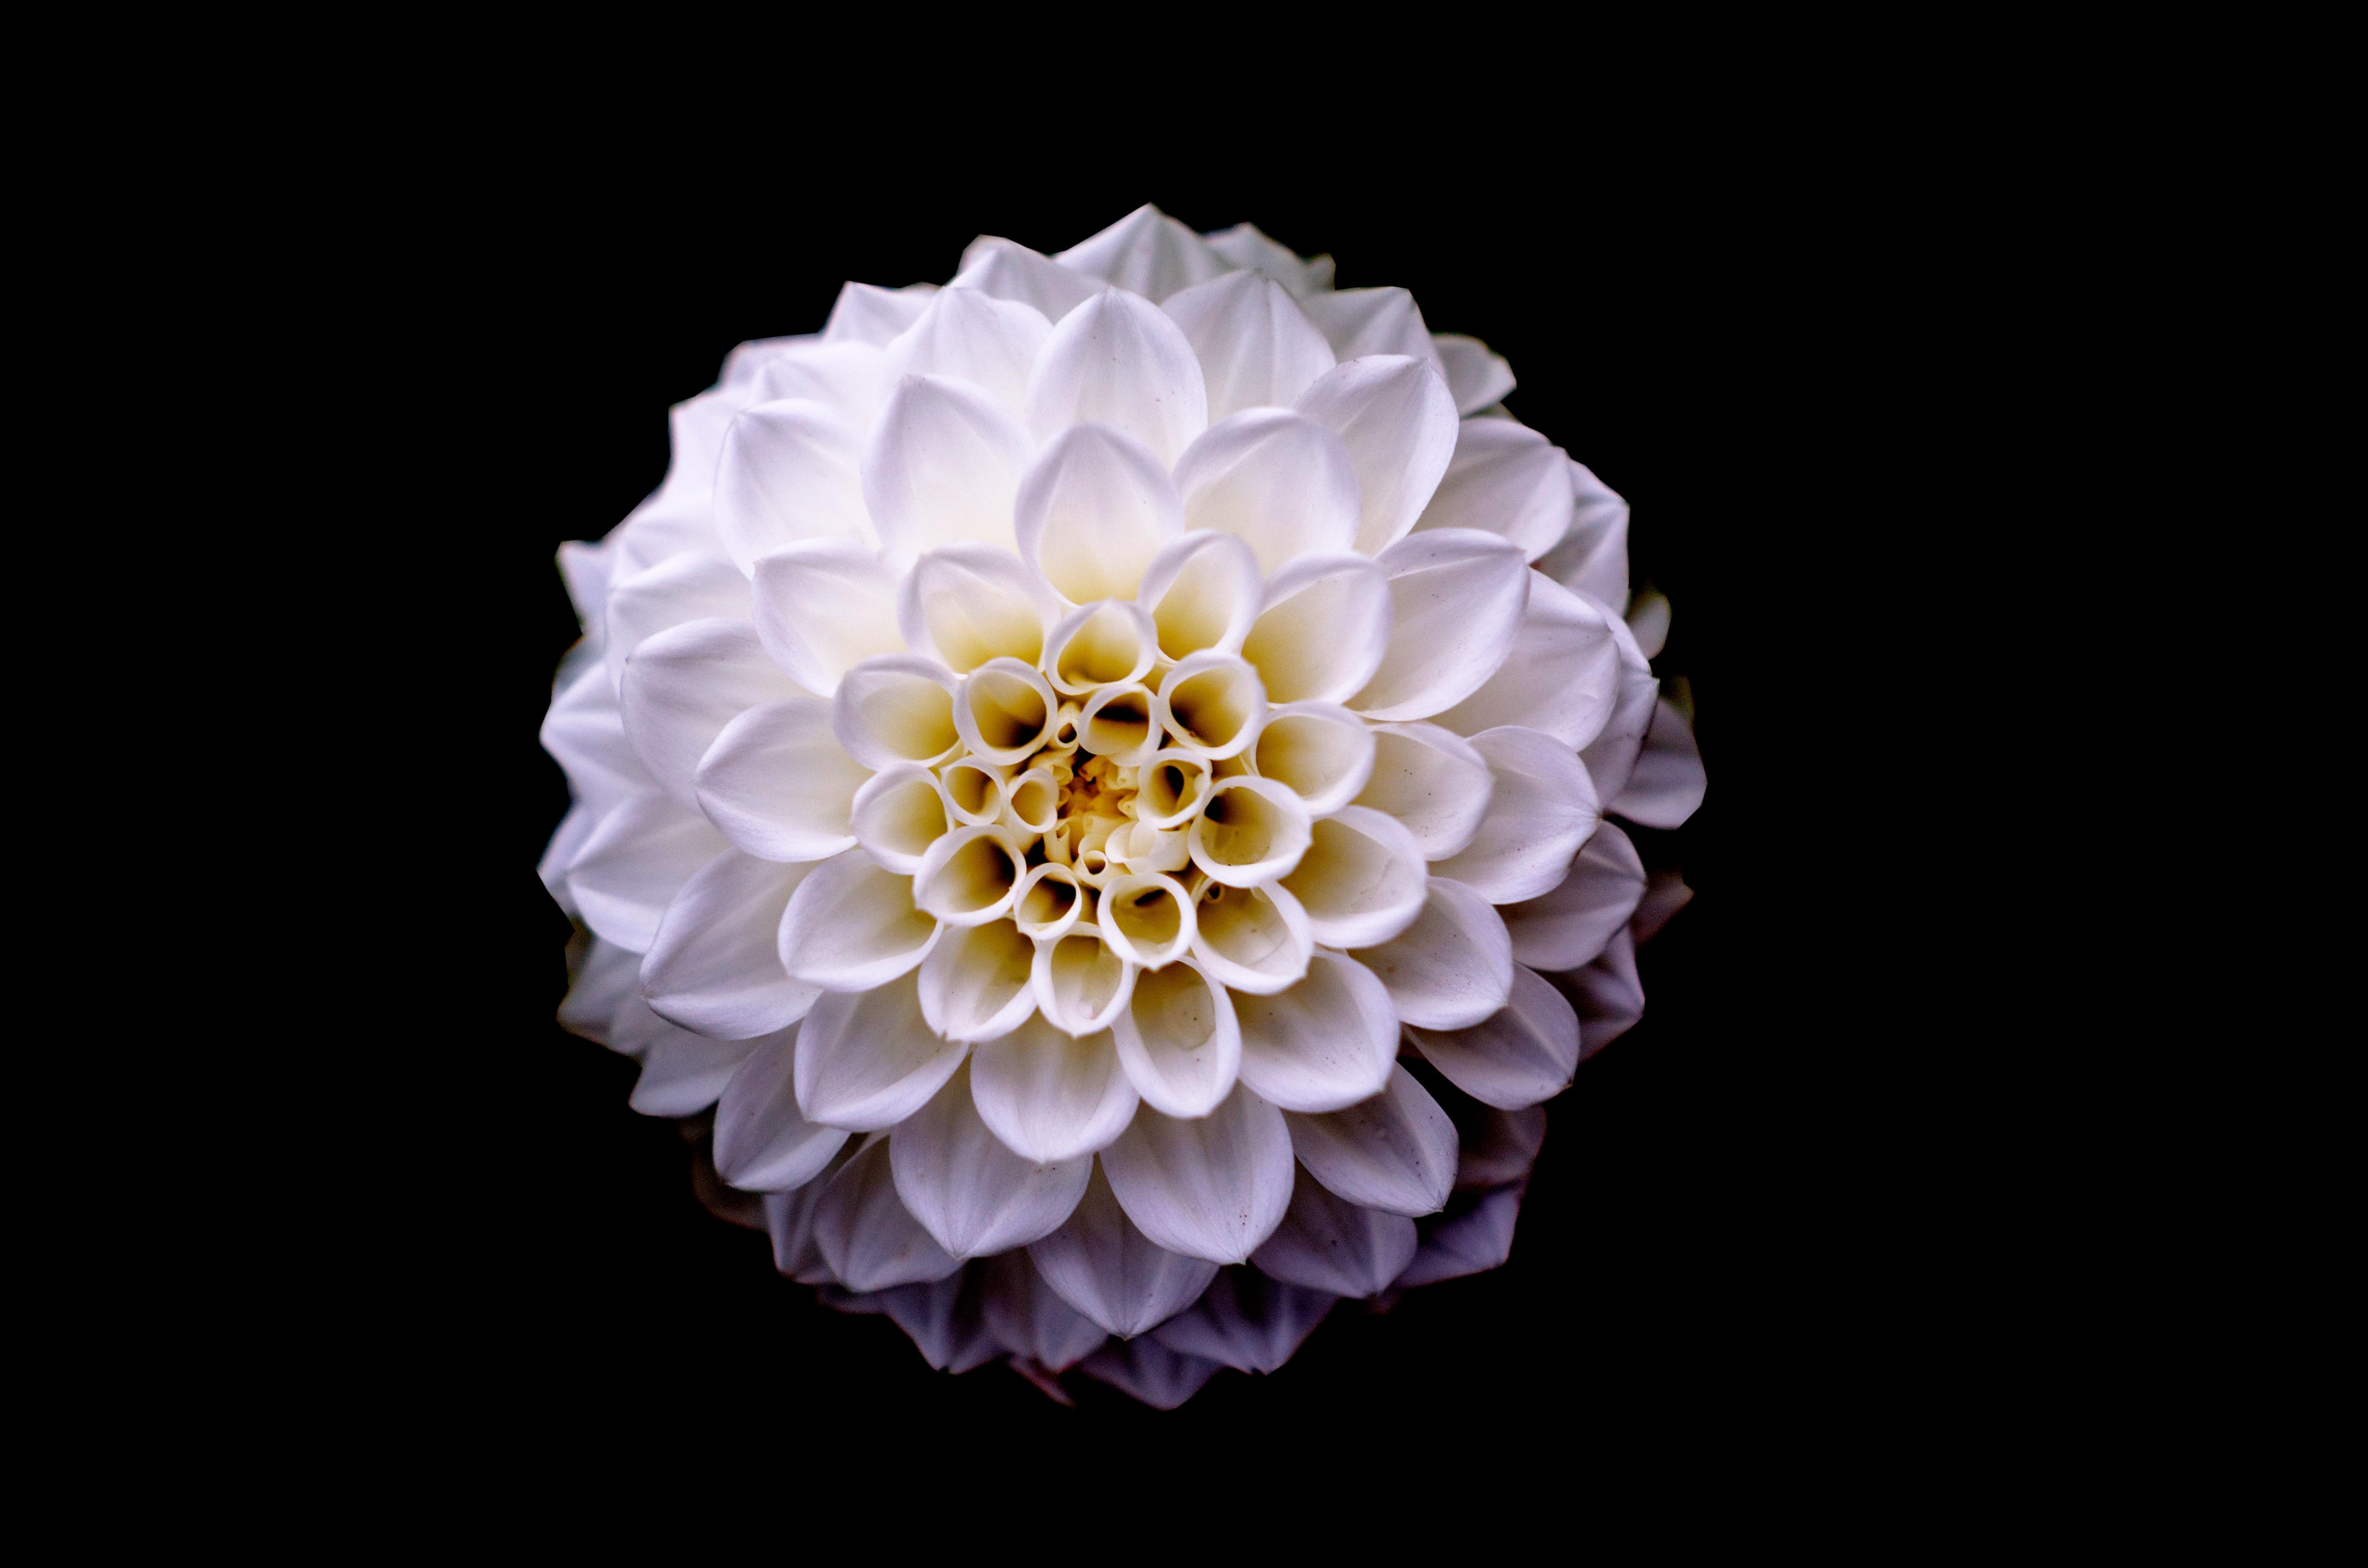 White and Yellow Flower Macro Photography